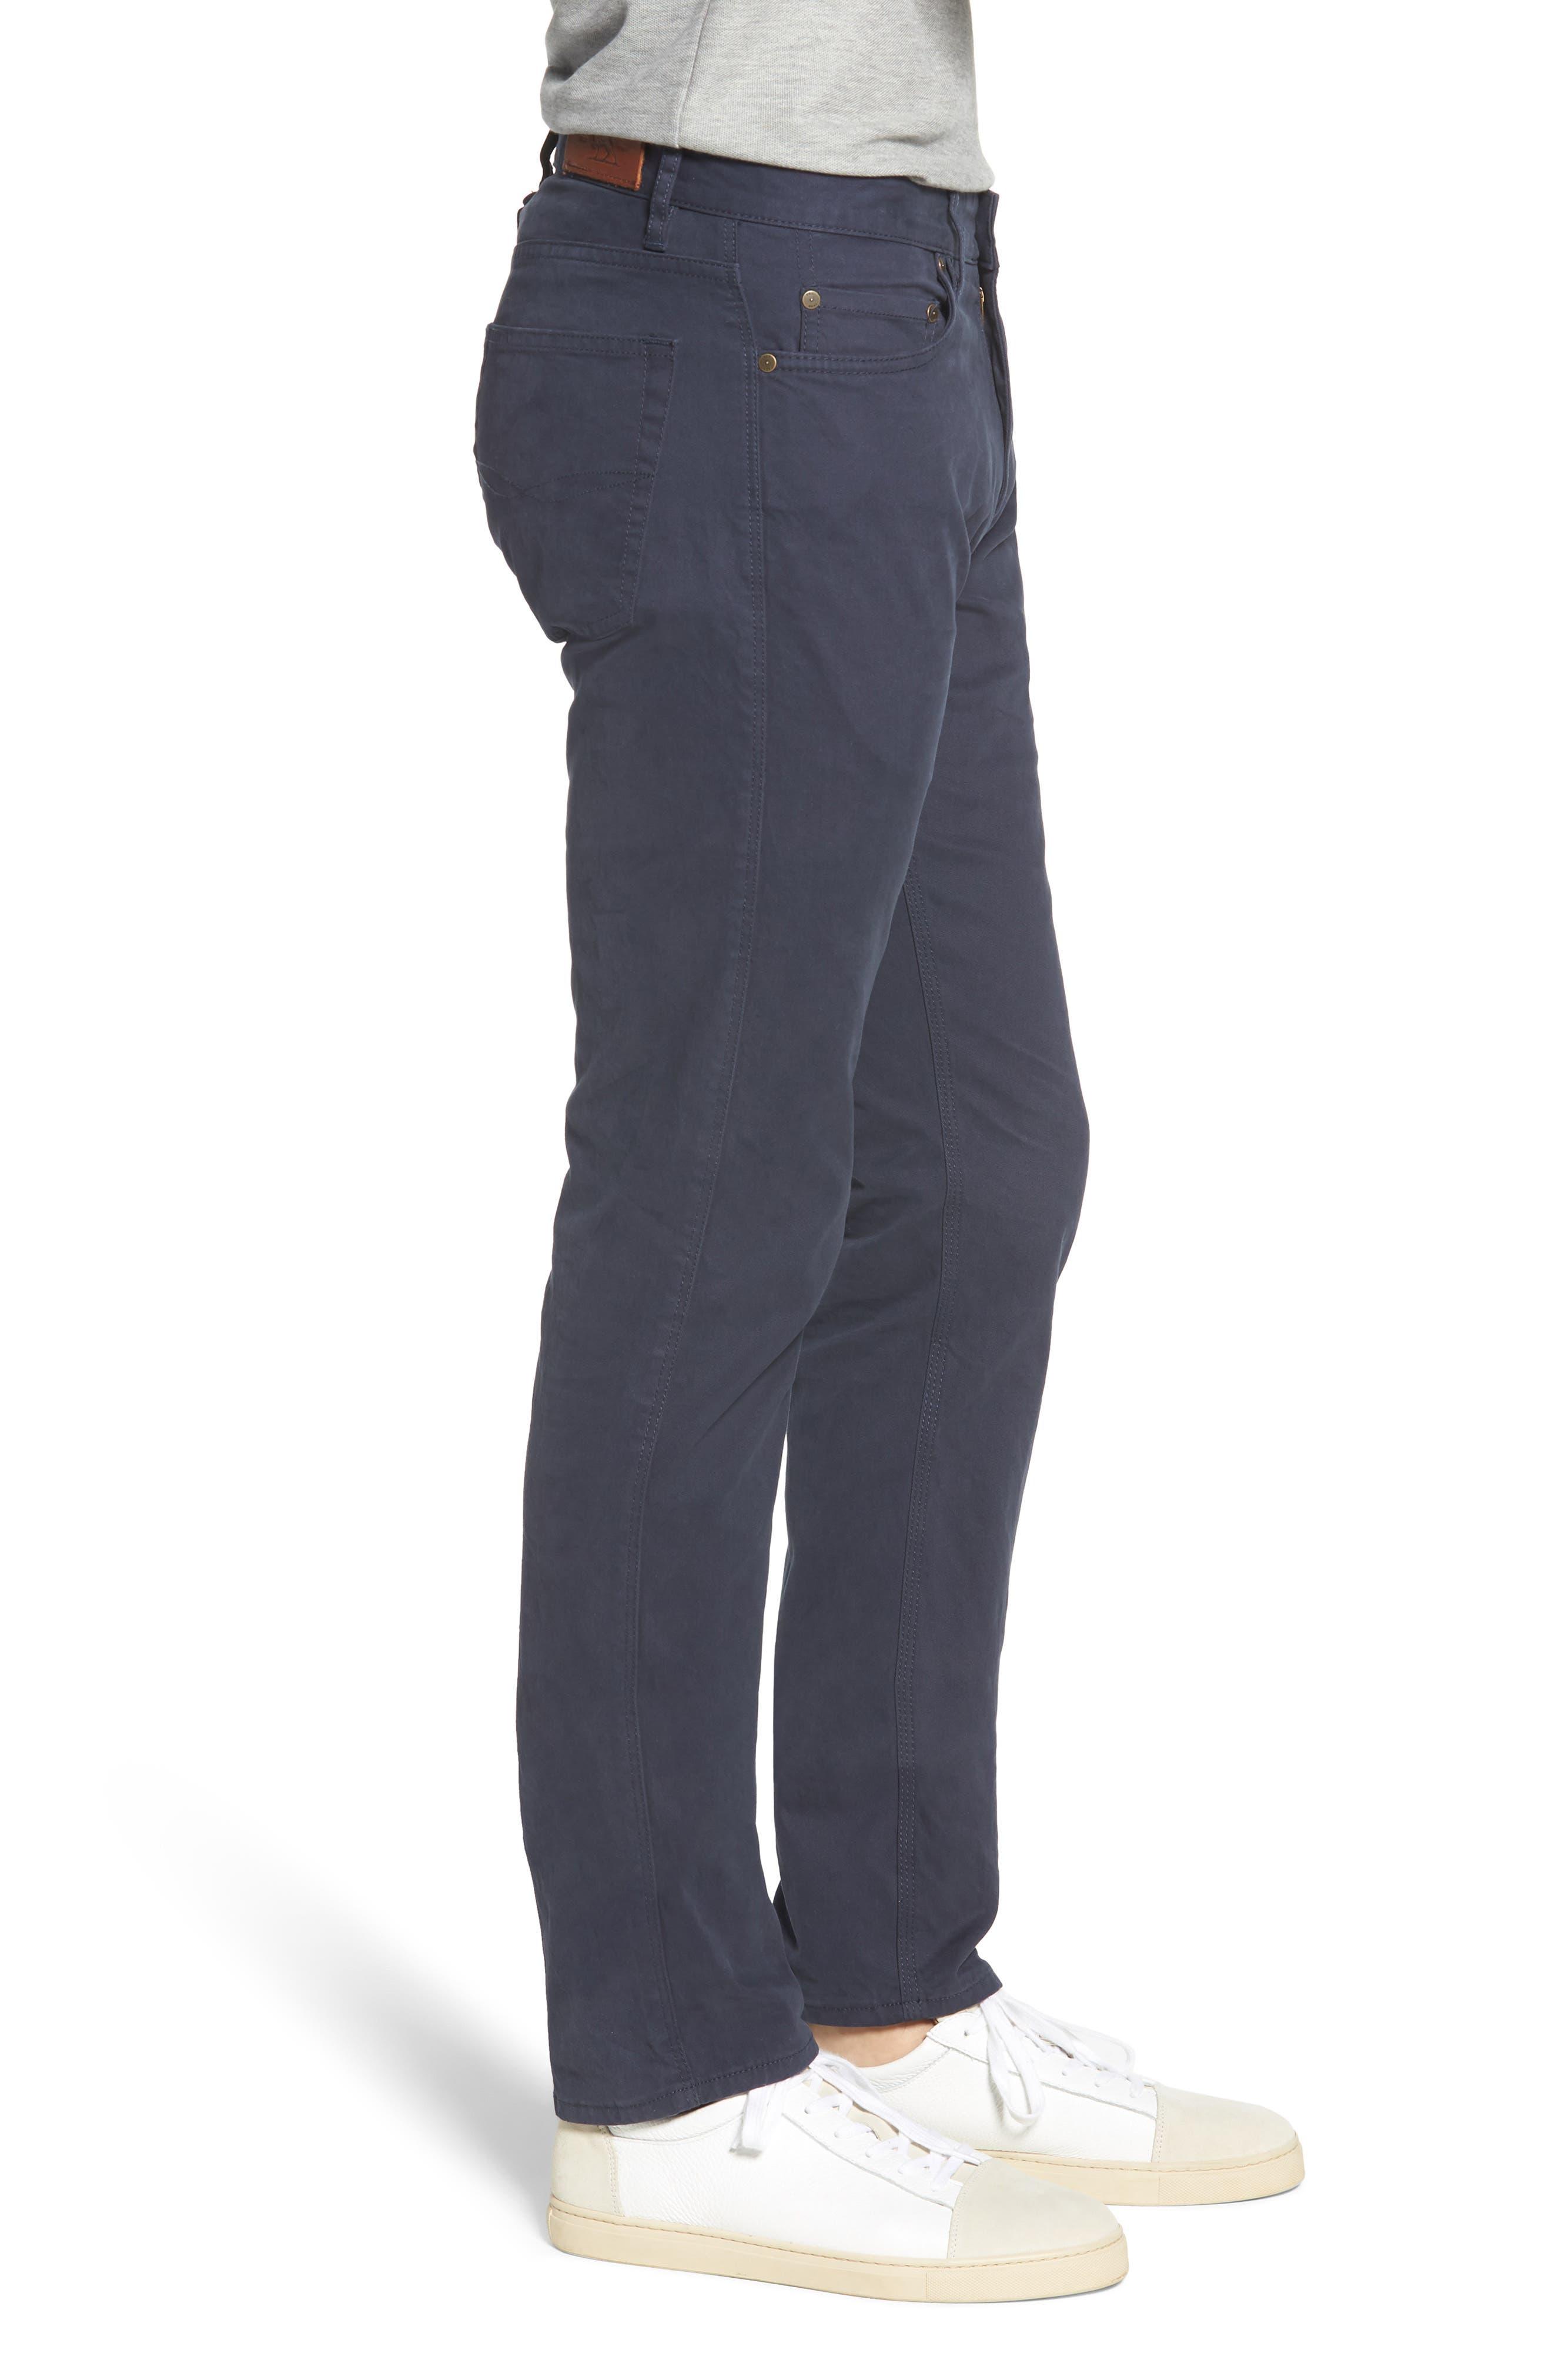 Fencourt Regular Fit Straight Leg Jeans,                             Alternate thumbnail 3, color,                             MIDNIGHT